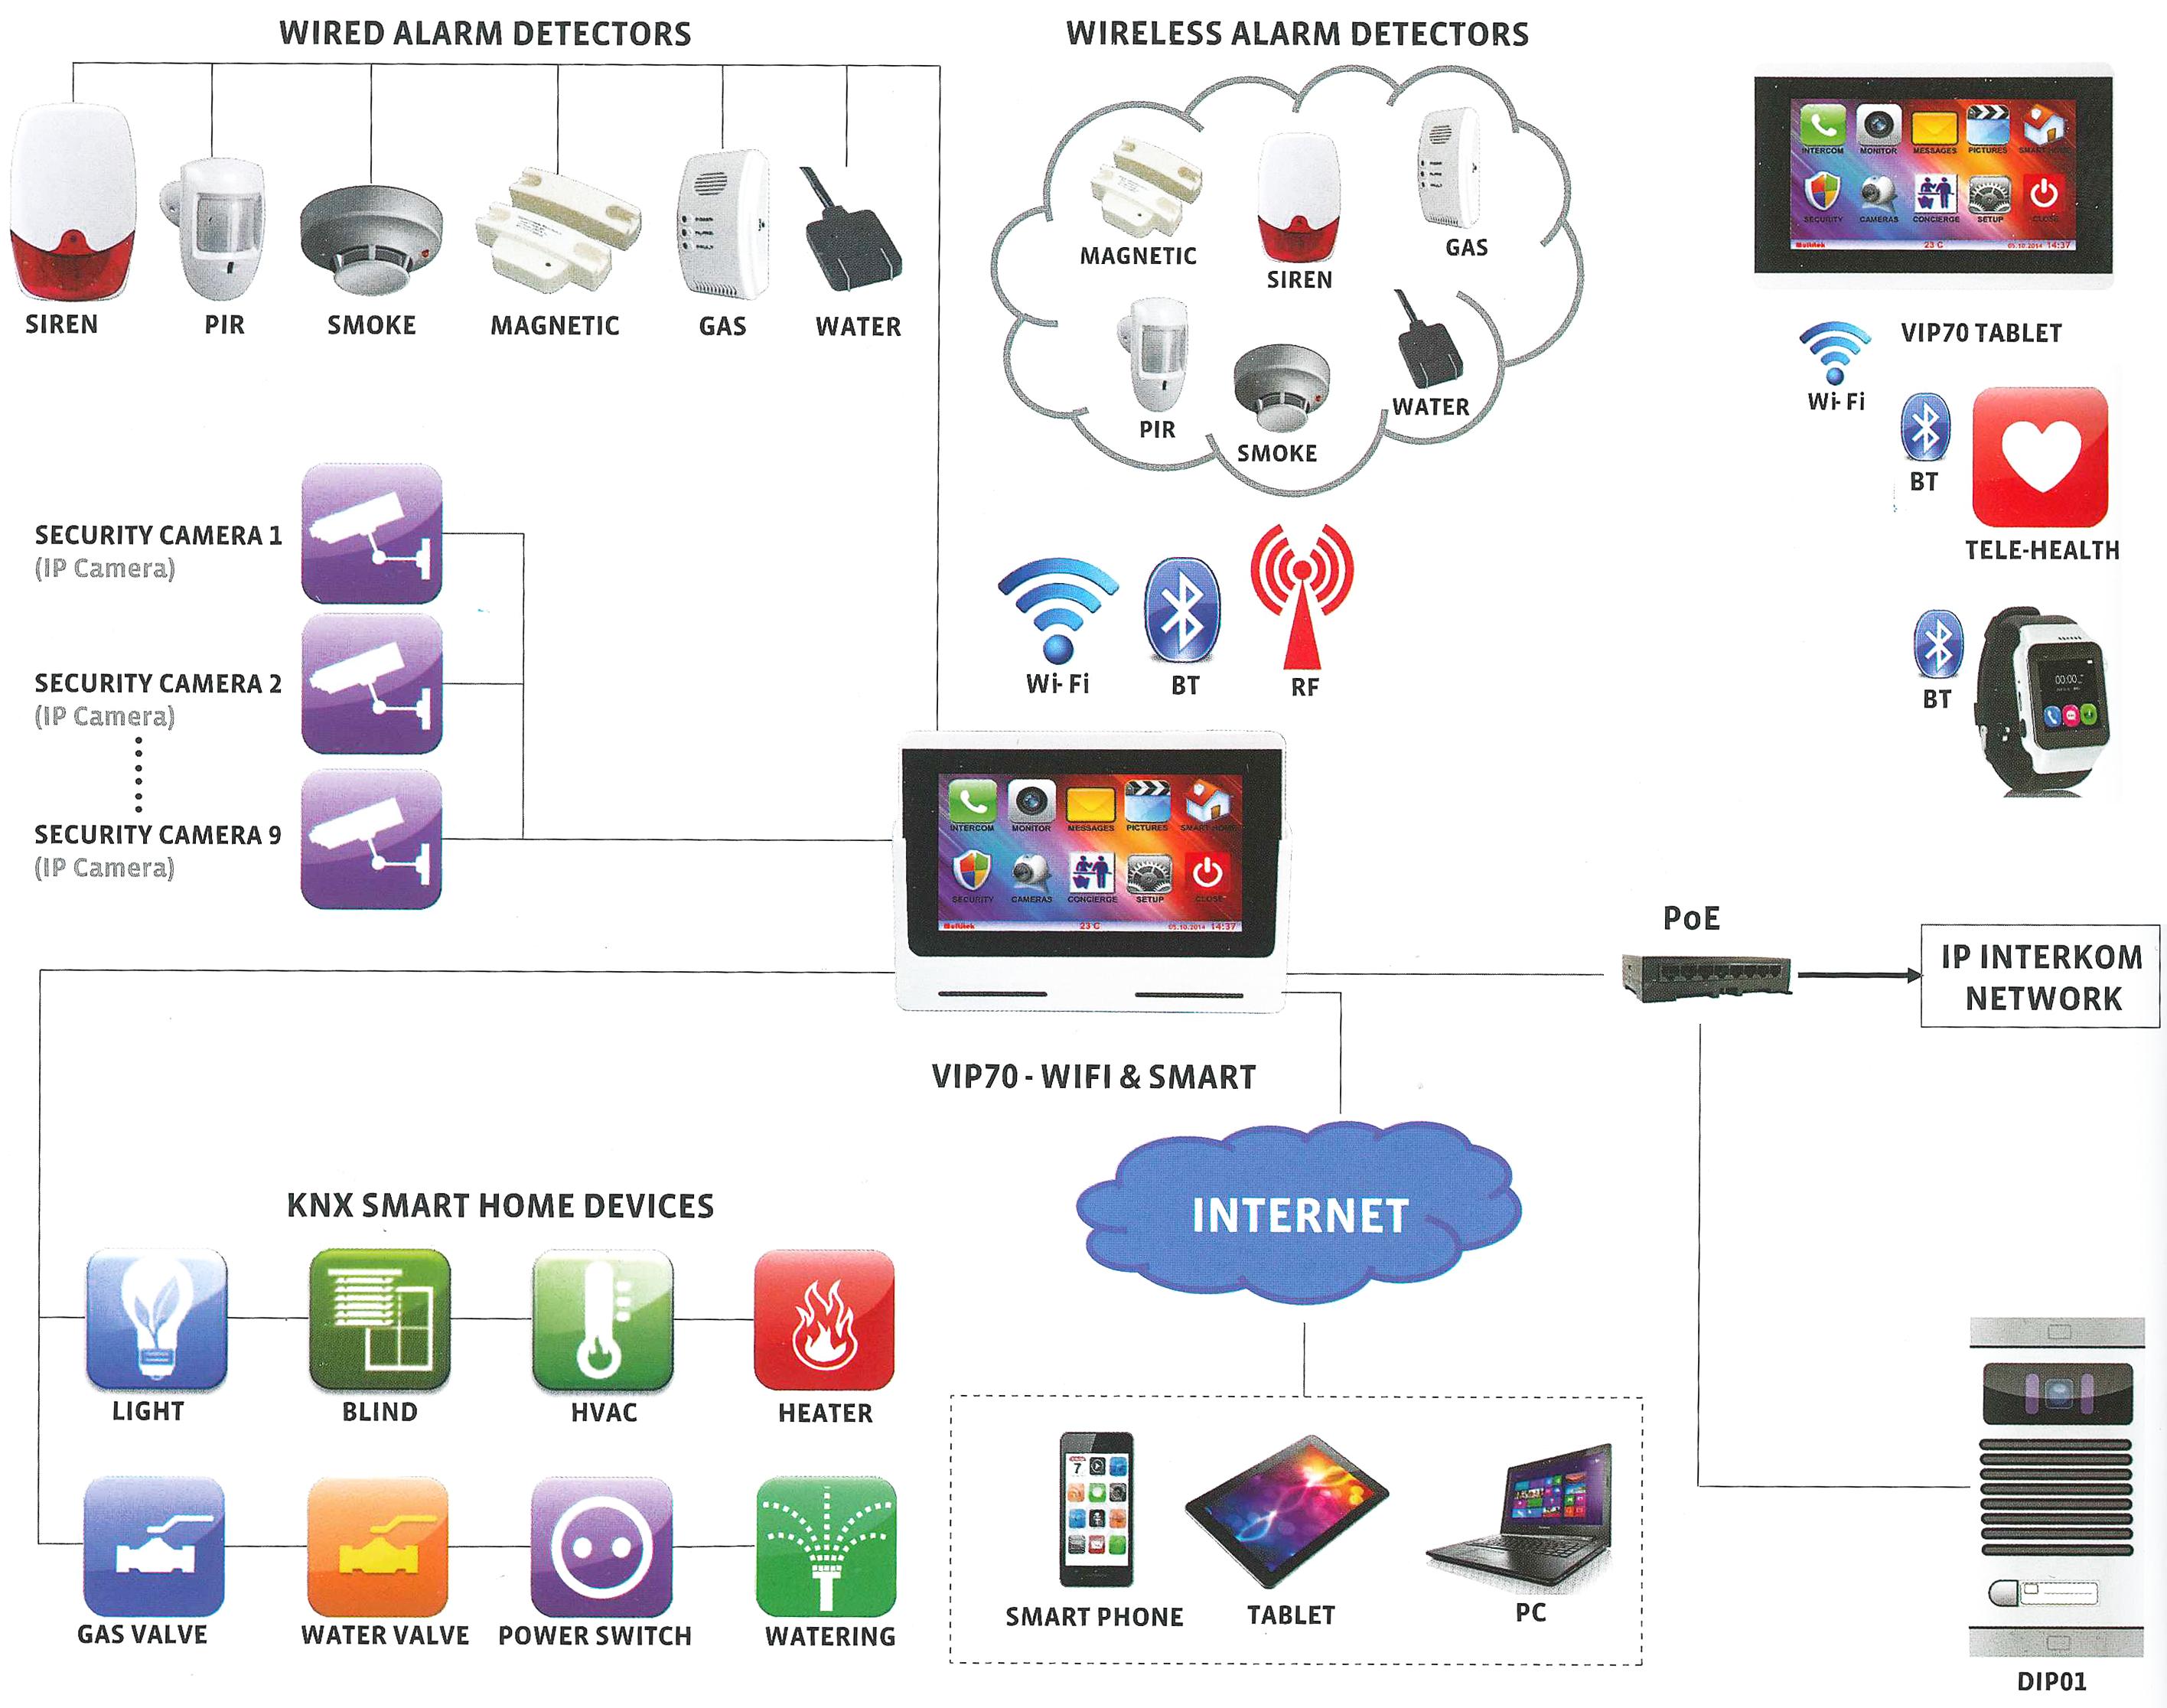 vip70 networkdiagram dallas deltaNetworkdiag #21